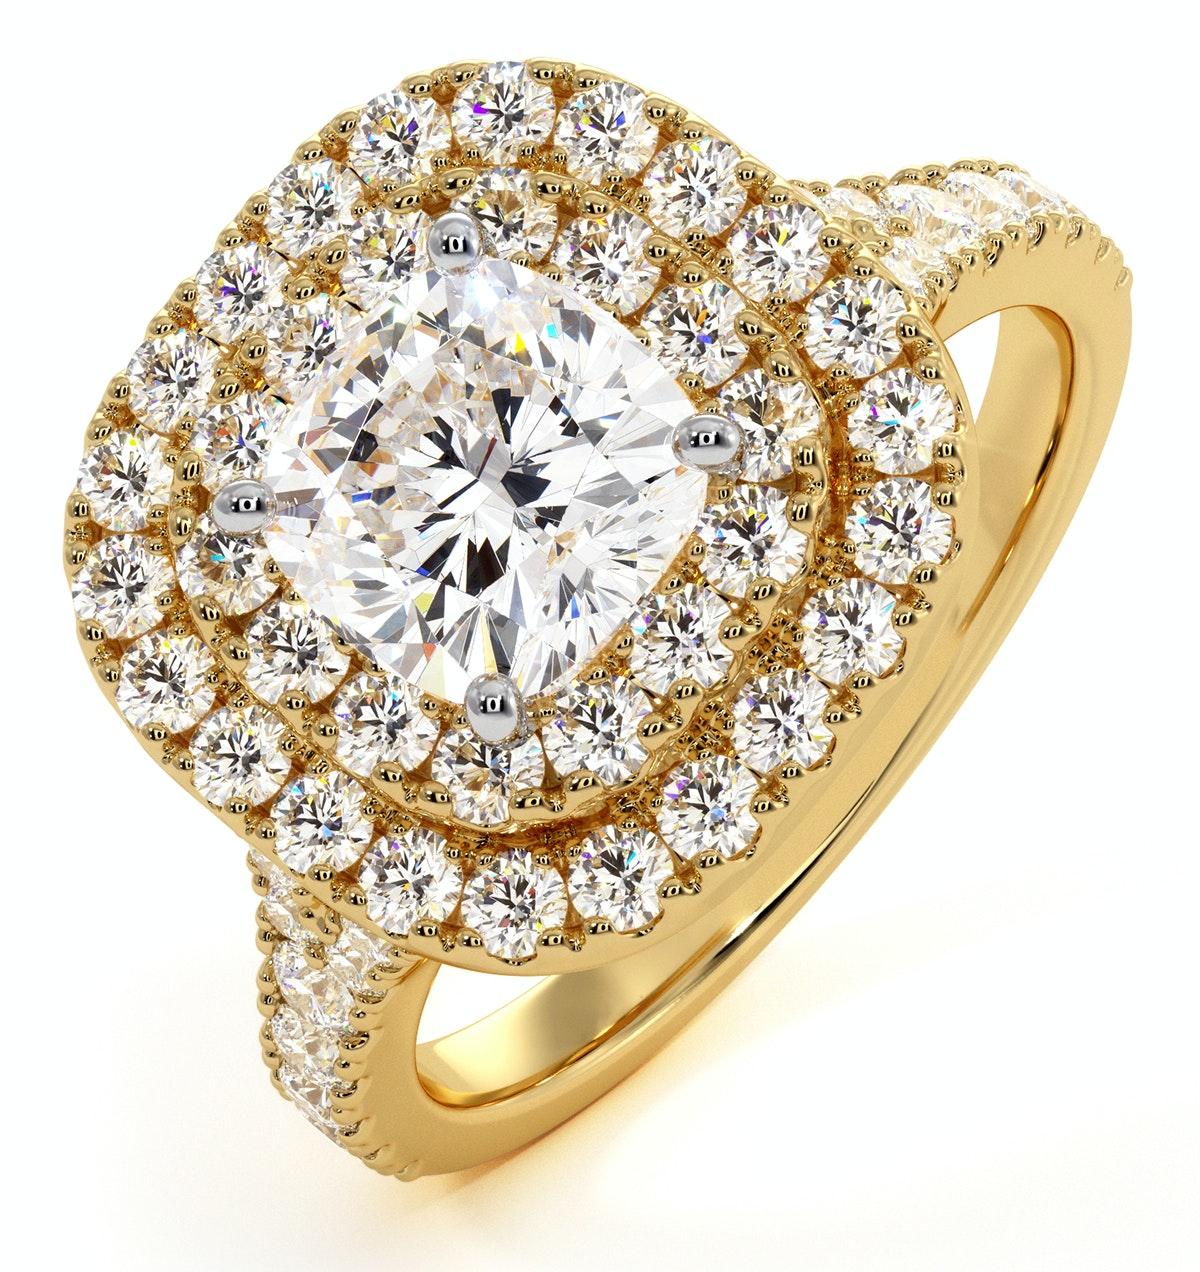 Anastasia GIA Diamond Halo Engagement Ring in 18K Gold 1.70ct G/VS2